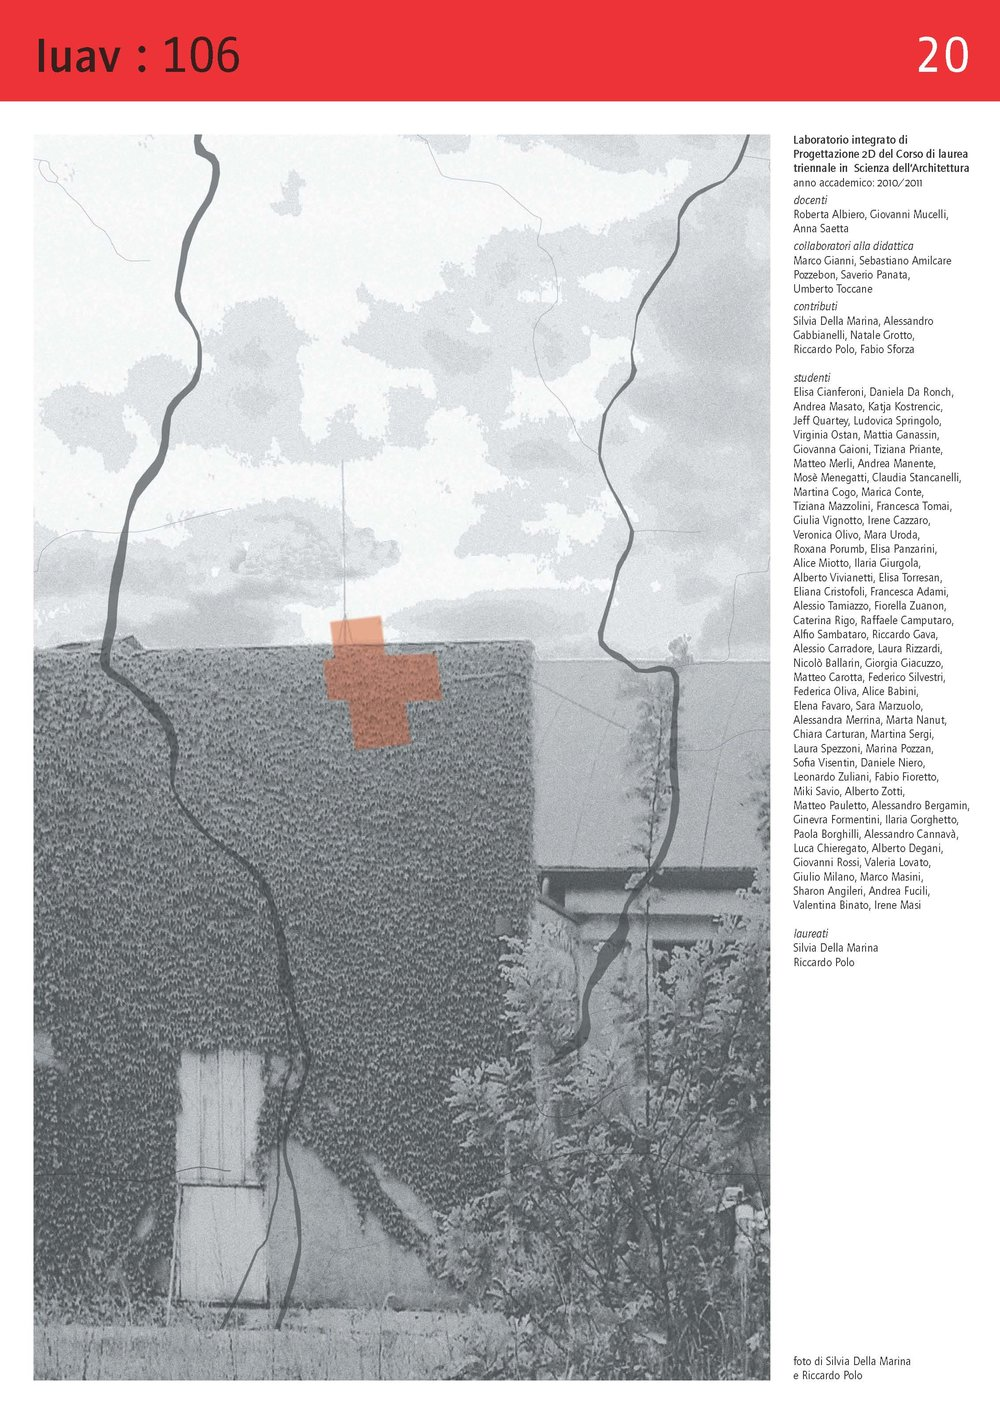 Copertine_Pagina_21.jpg